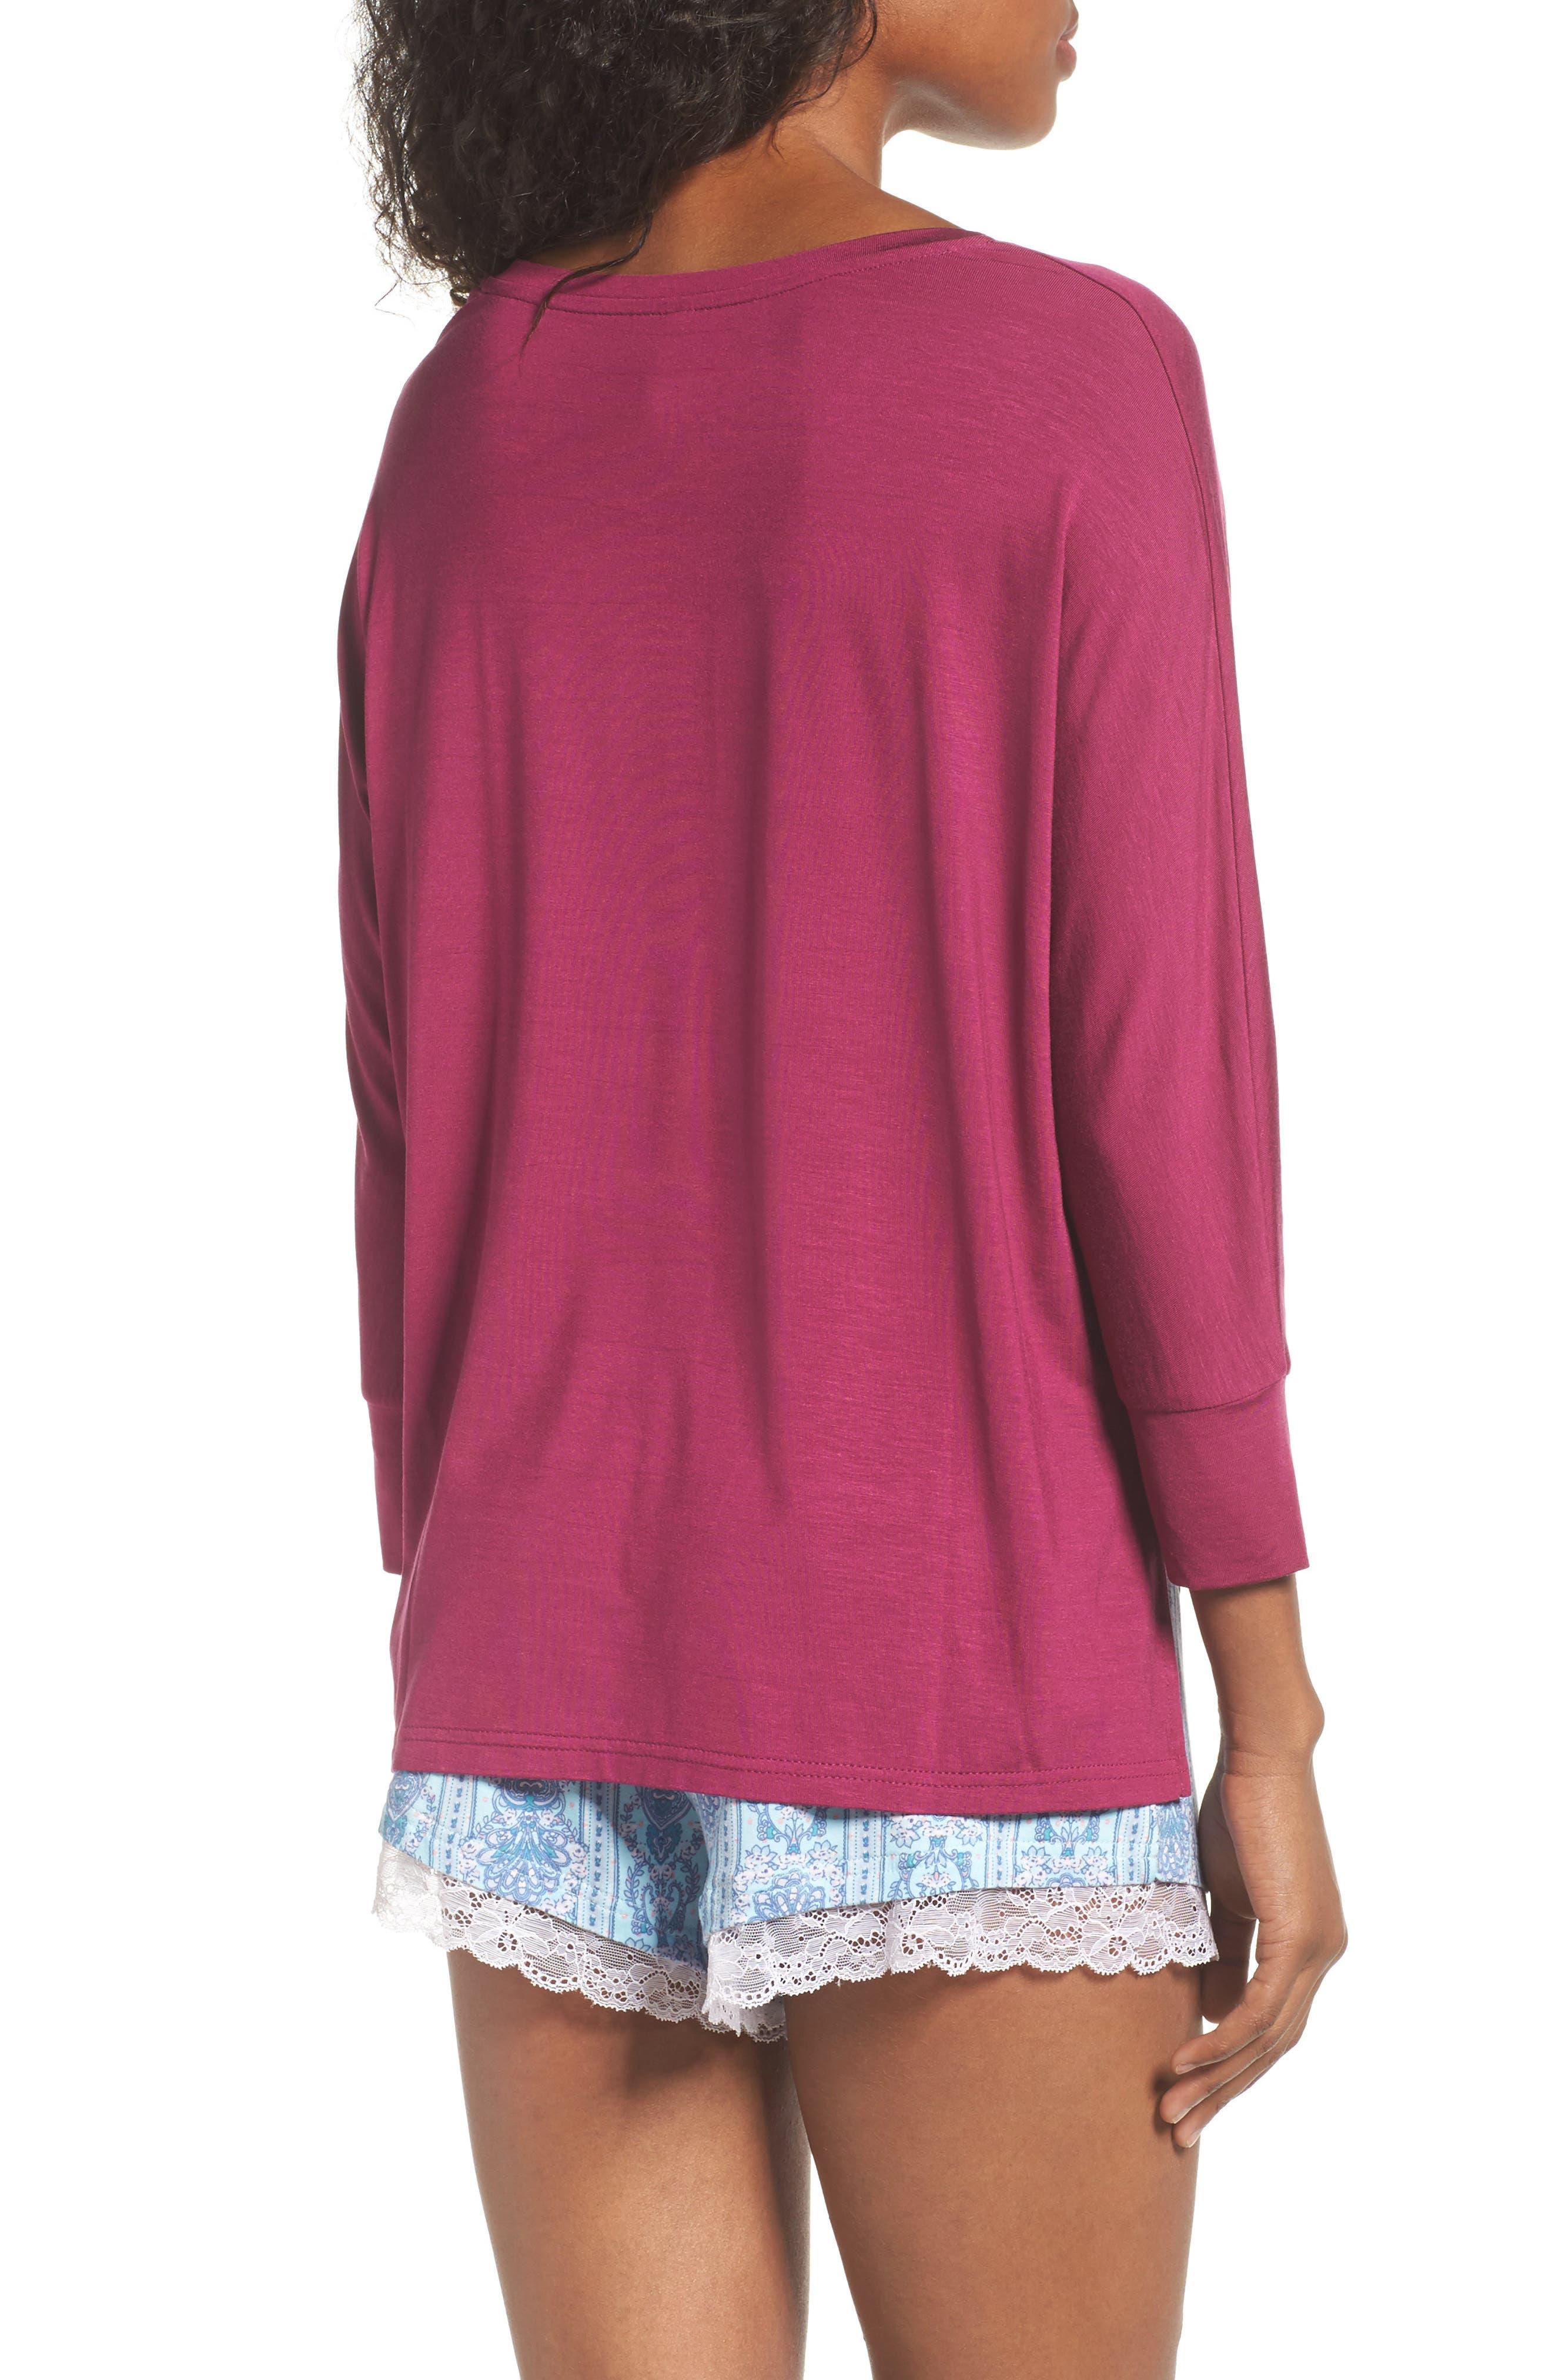 Honeydew Short Pajamas,                             Alternate thumbnail 2, color,                             Tuscany